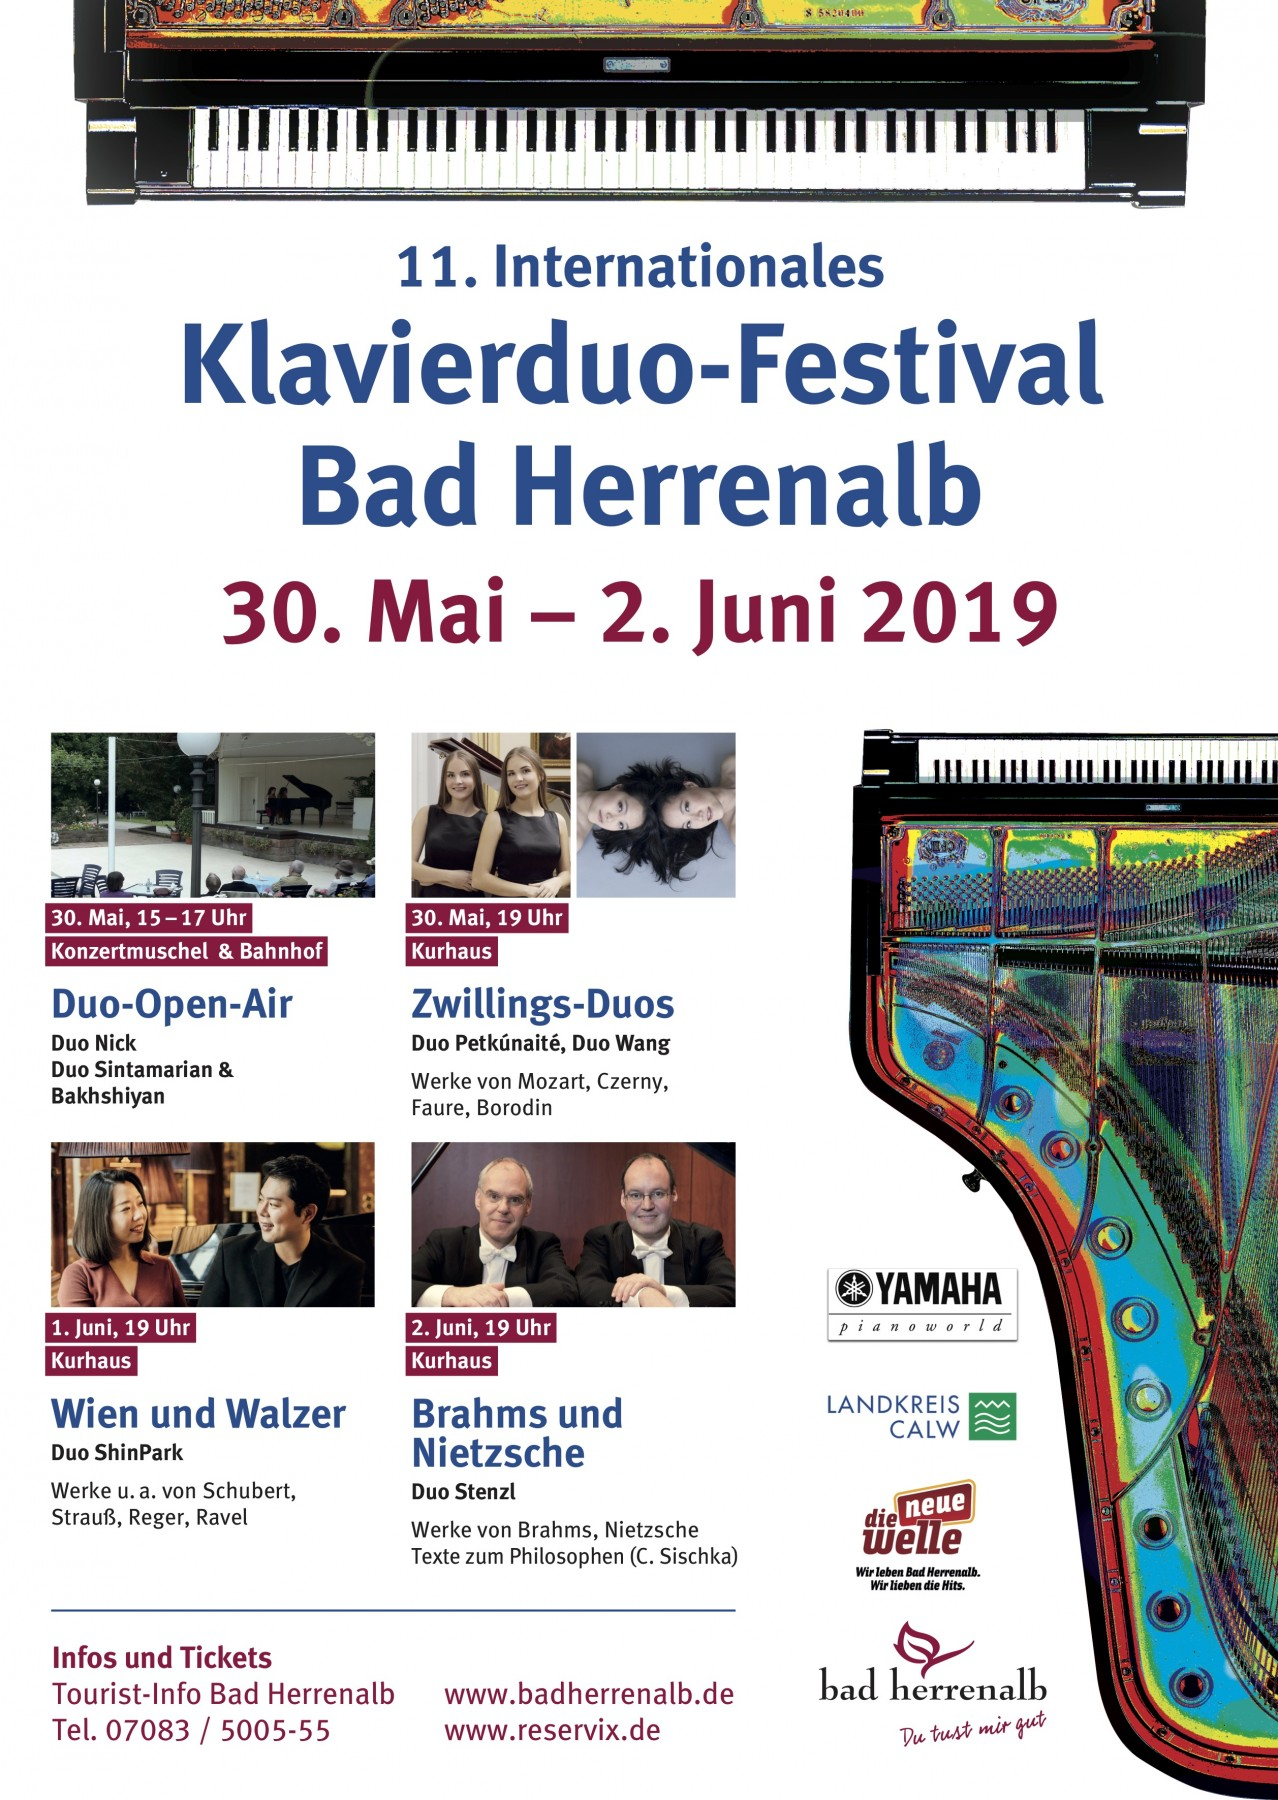 19-04-29_Klavierduo-Plakat_rz